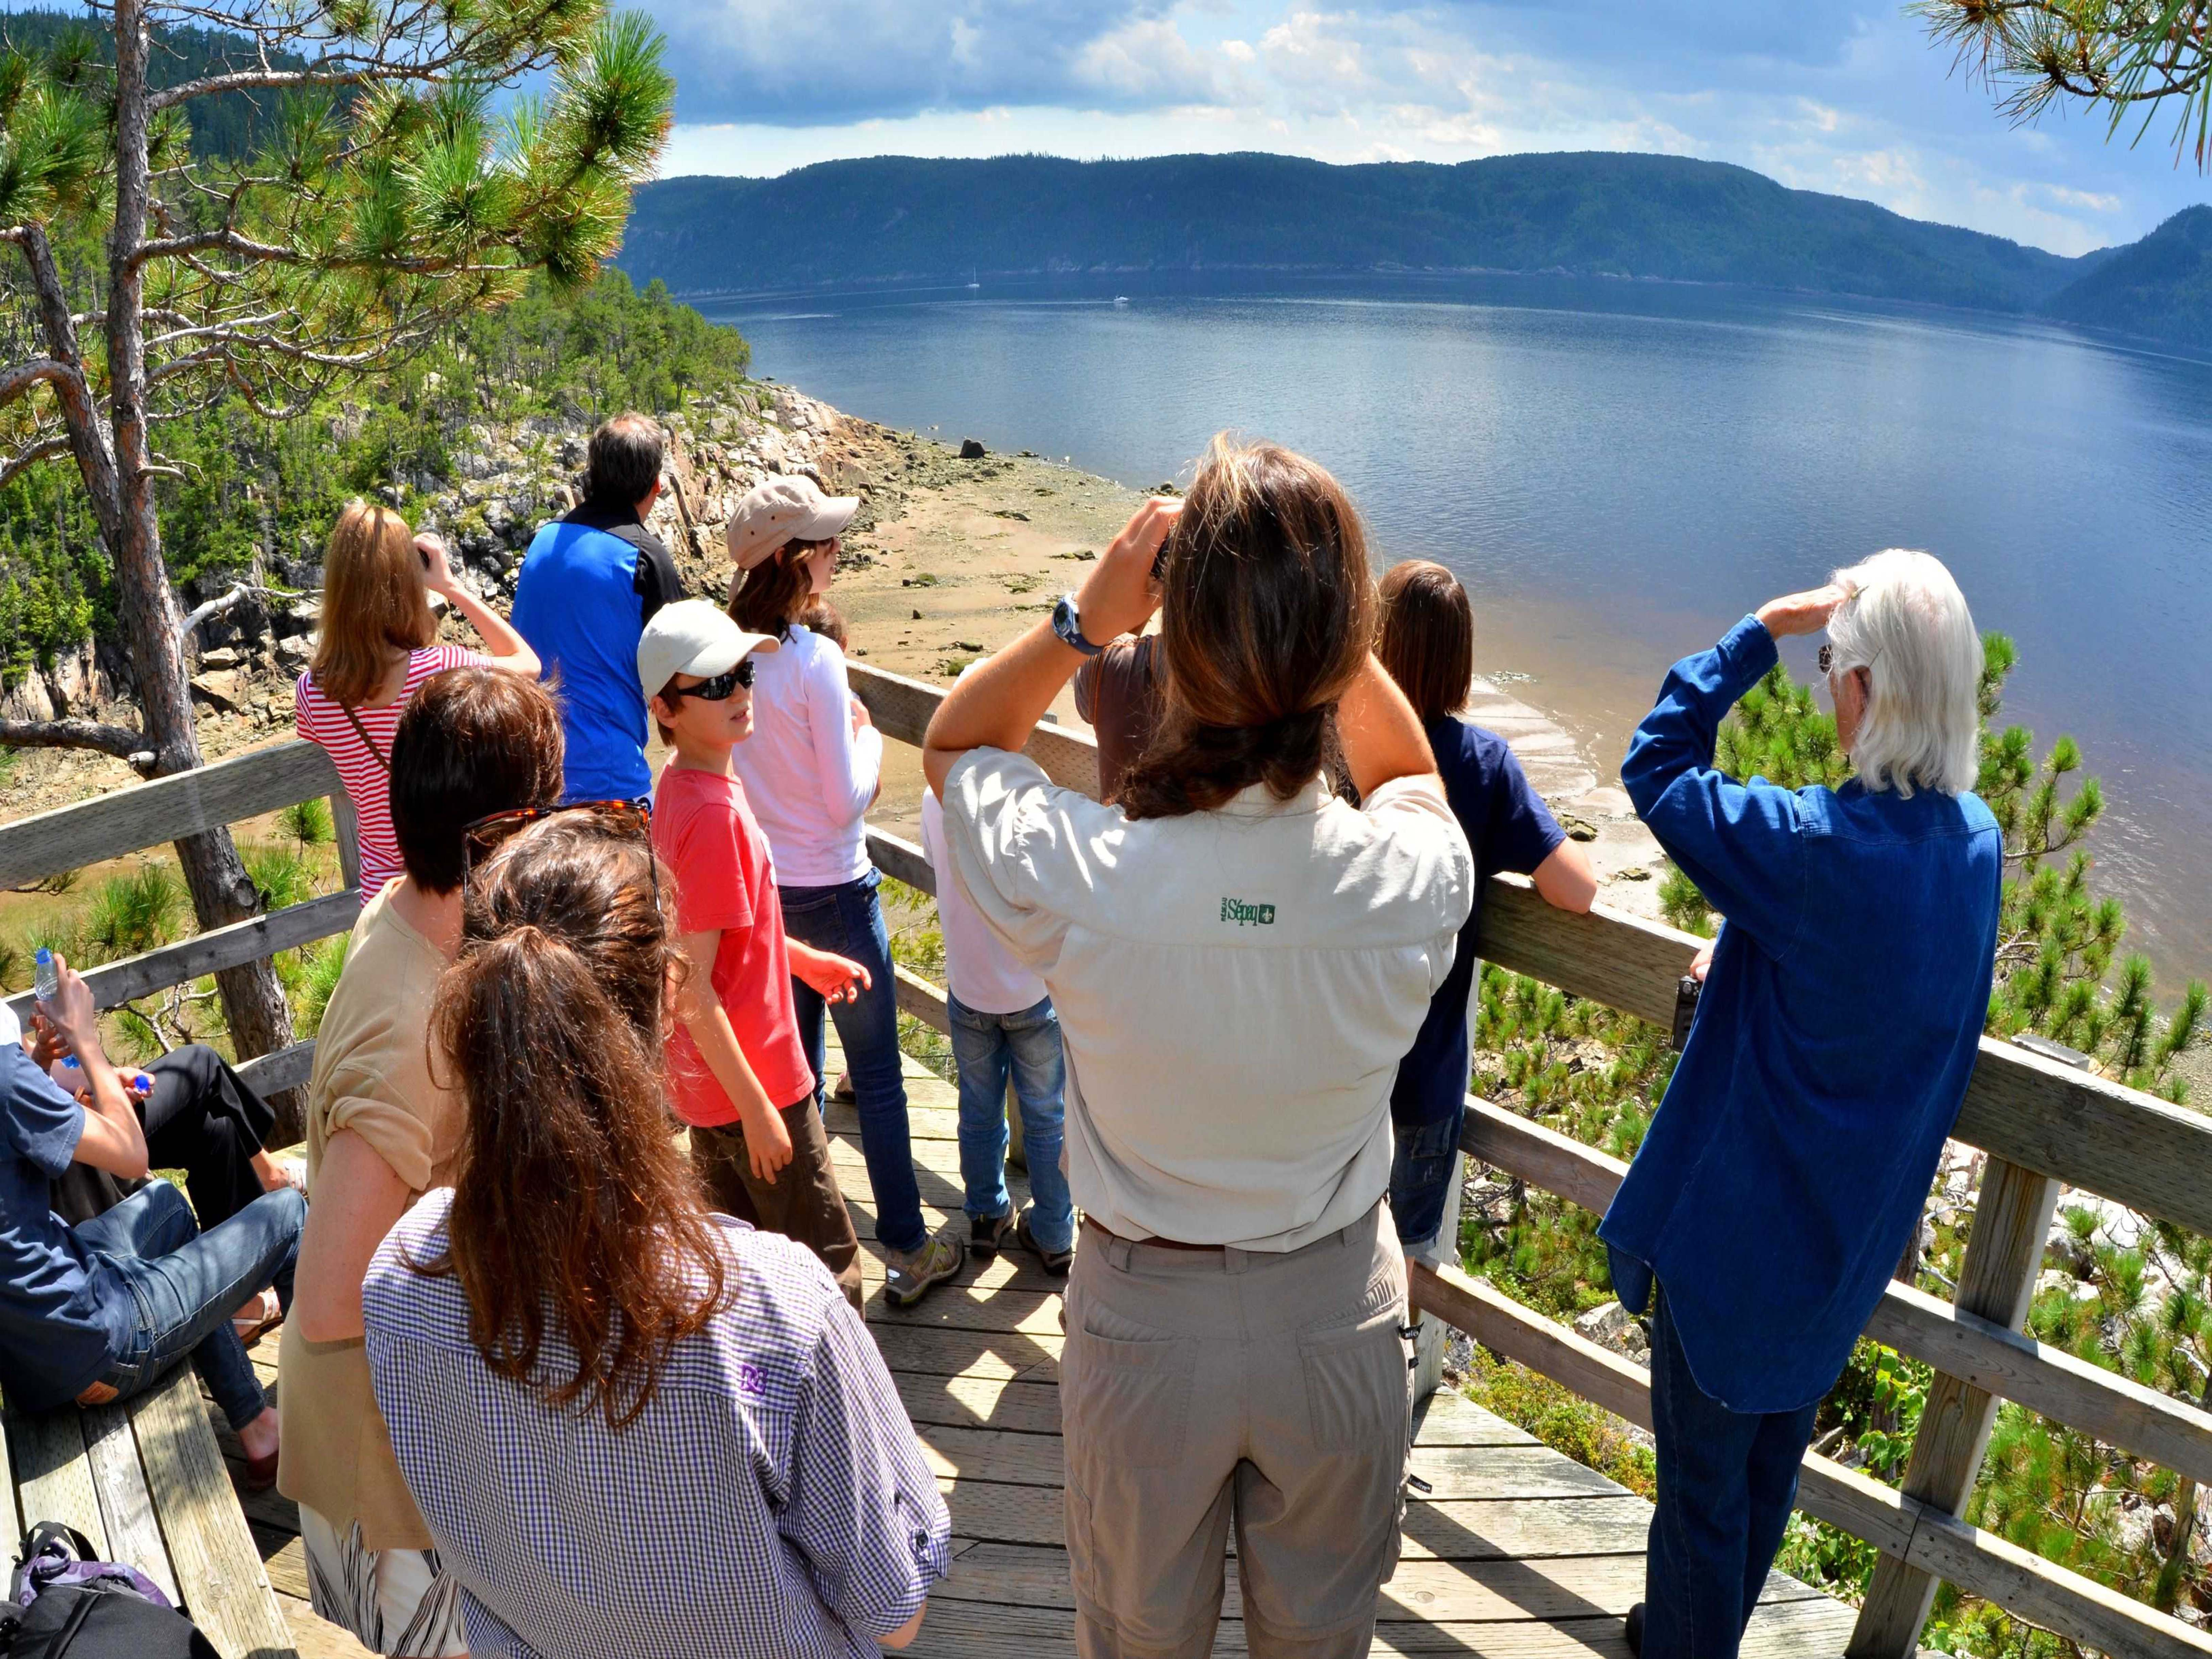 http://www.capauleste.com/wp-content/uploads/2016/08/vue-fjord-web.jpg